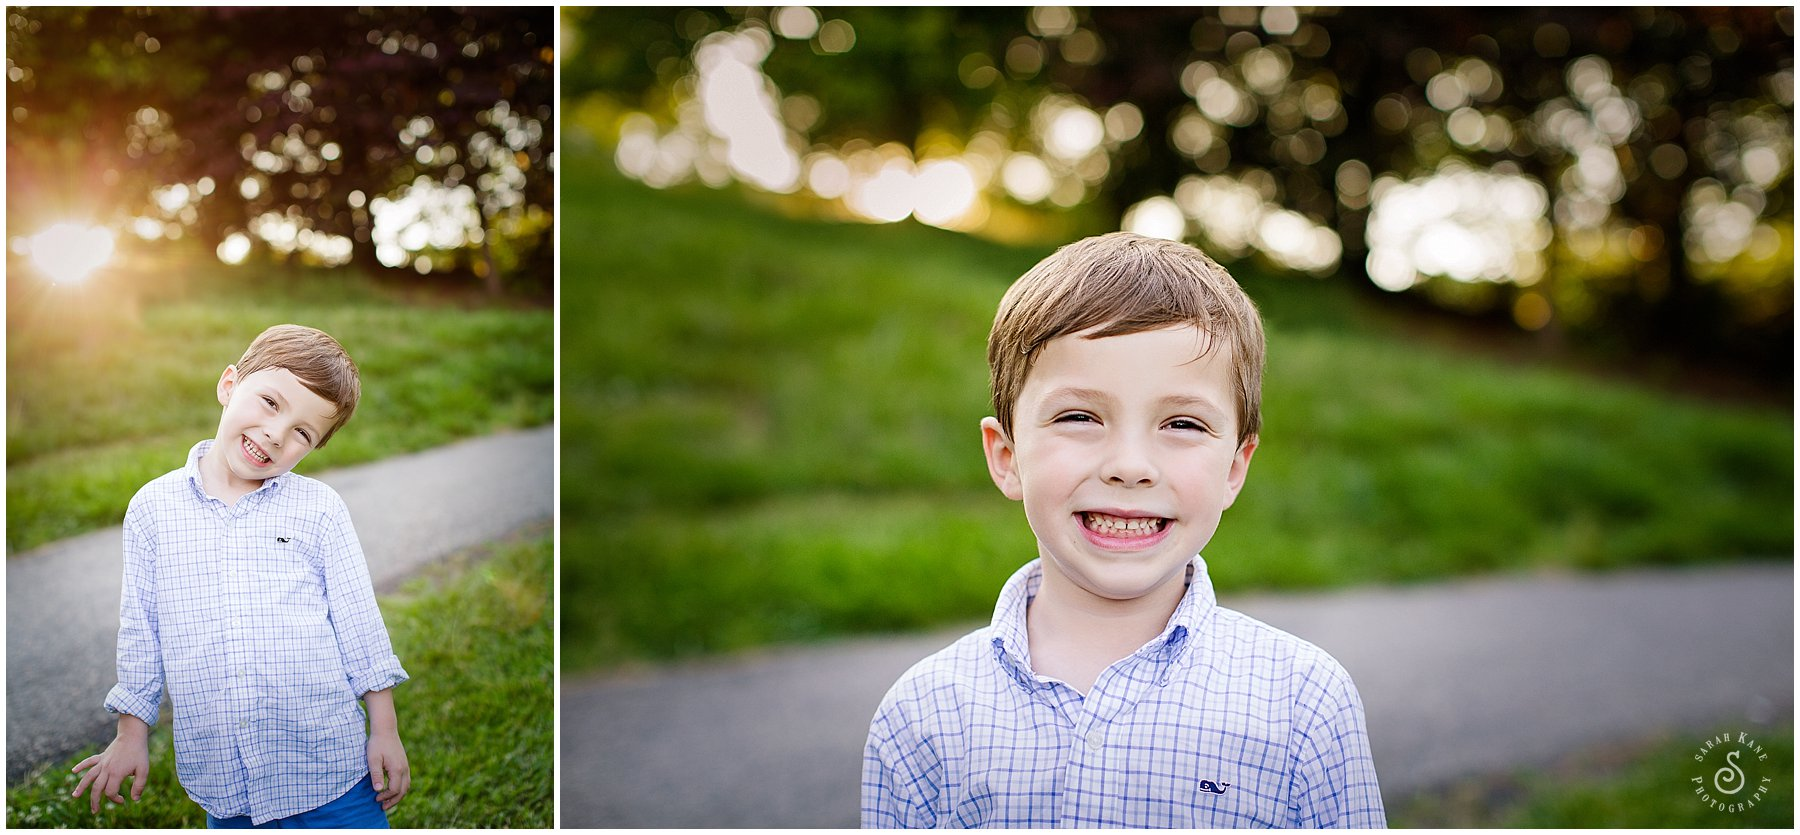 2_Lifestyle Family Portraits 132_ copy.jpg